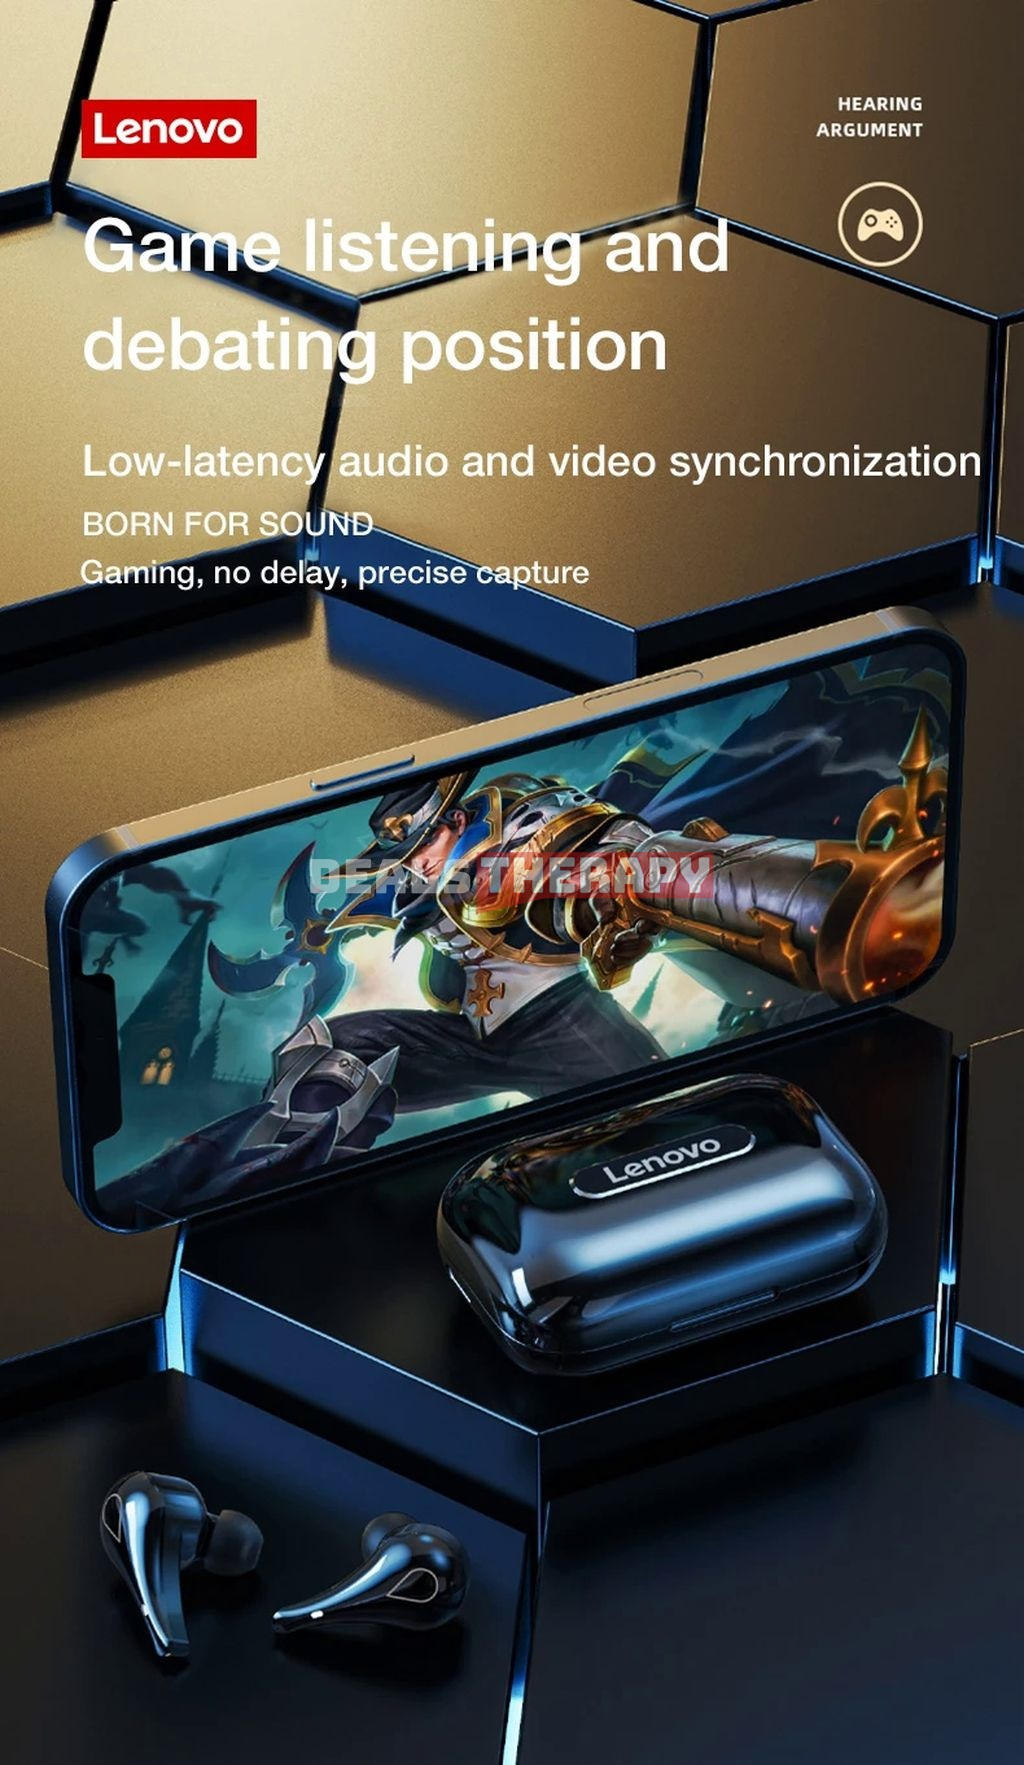 Lenovo LivePods LP3